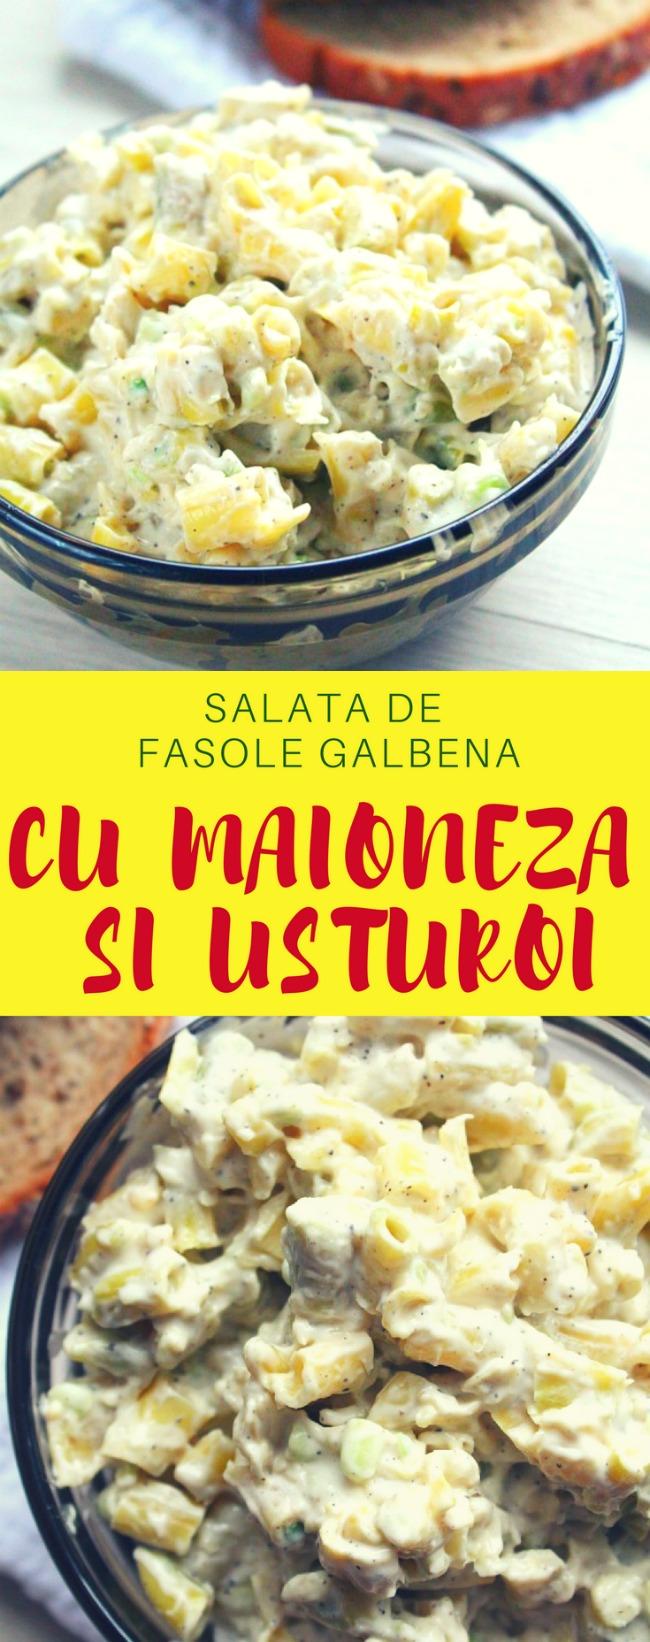 Salata de fasole galbena cu maioneza si usturoi